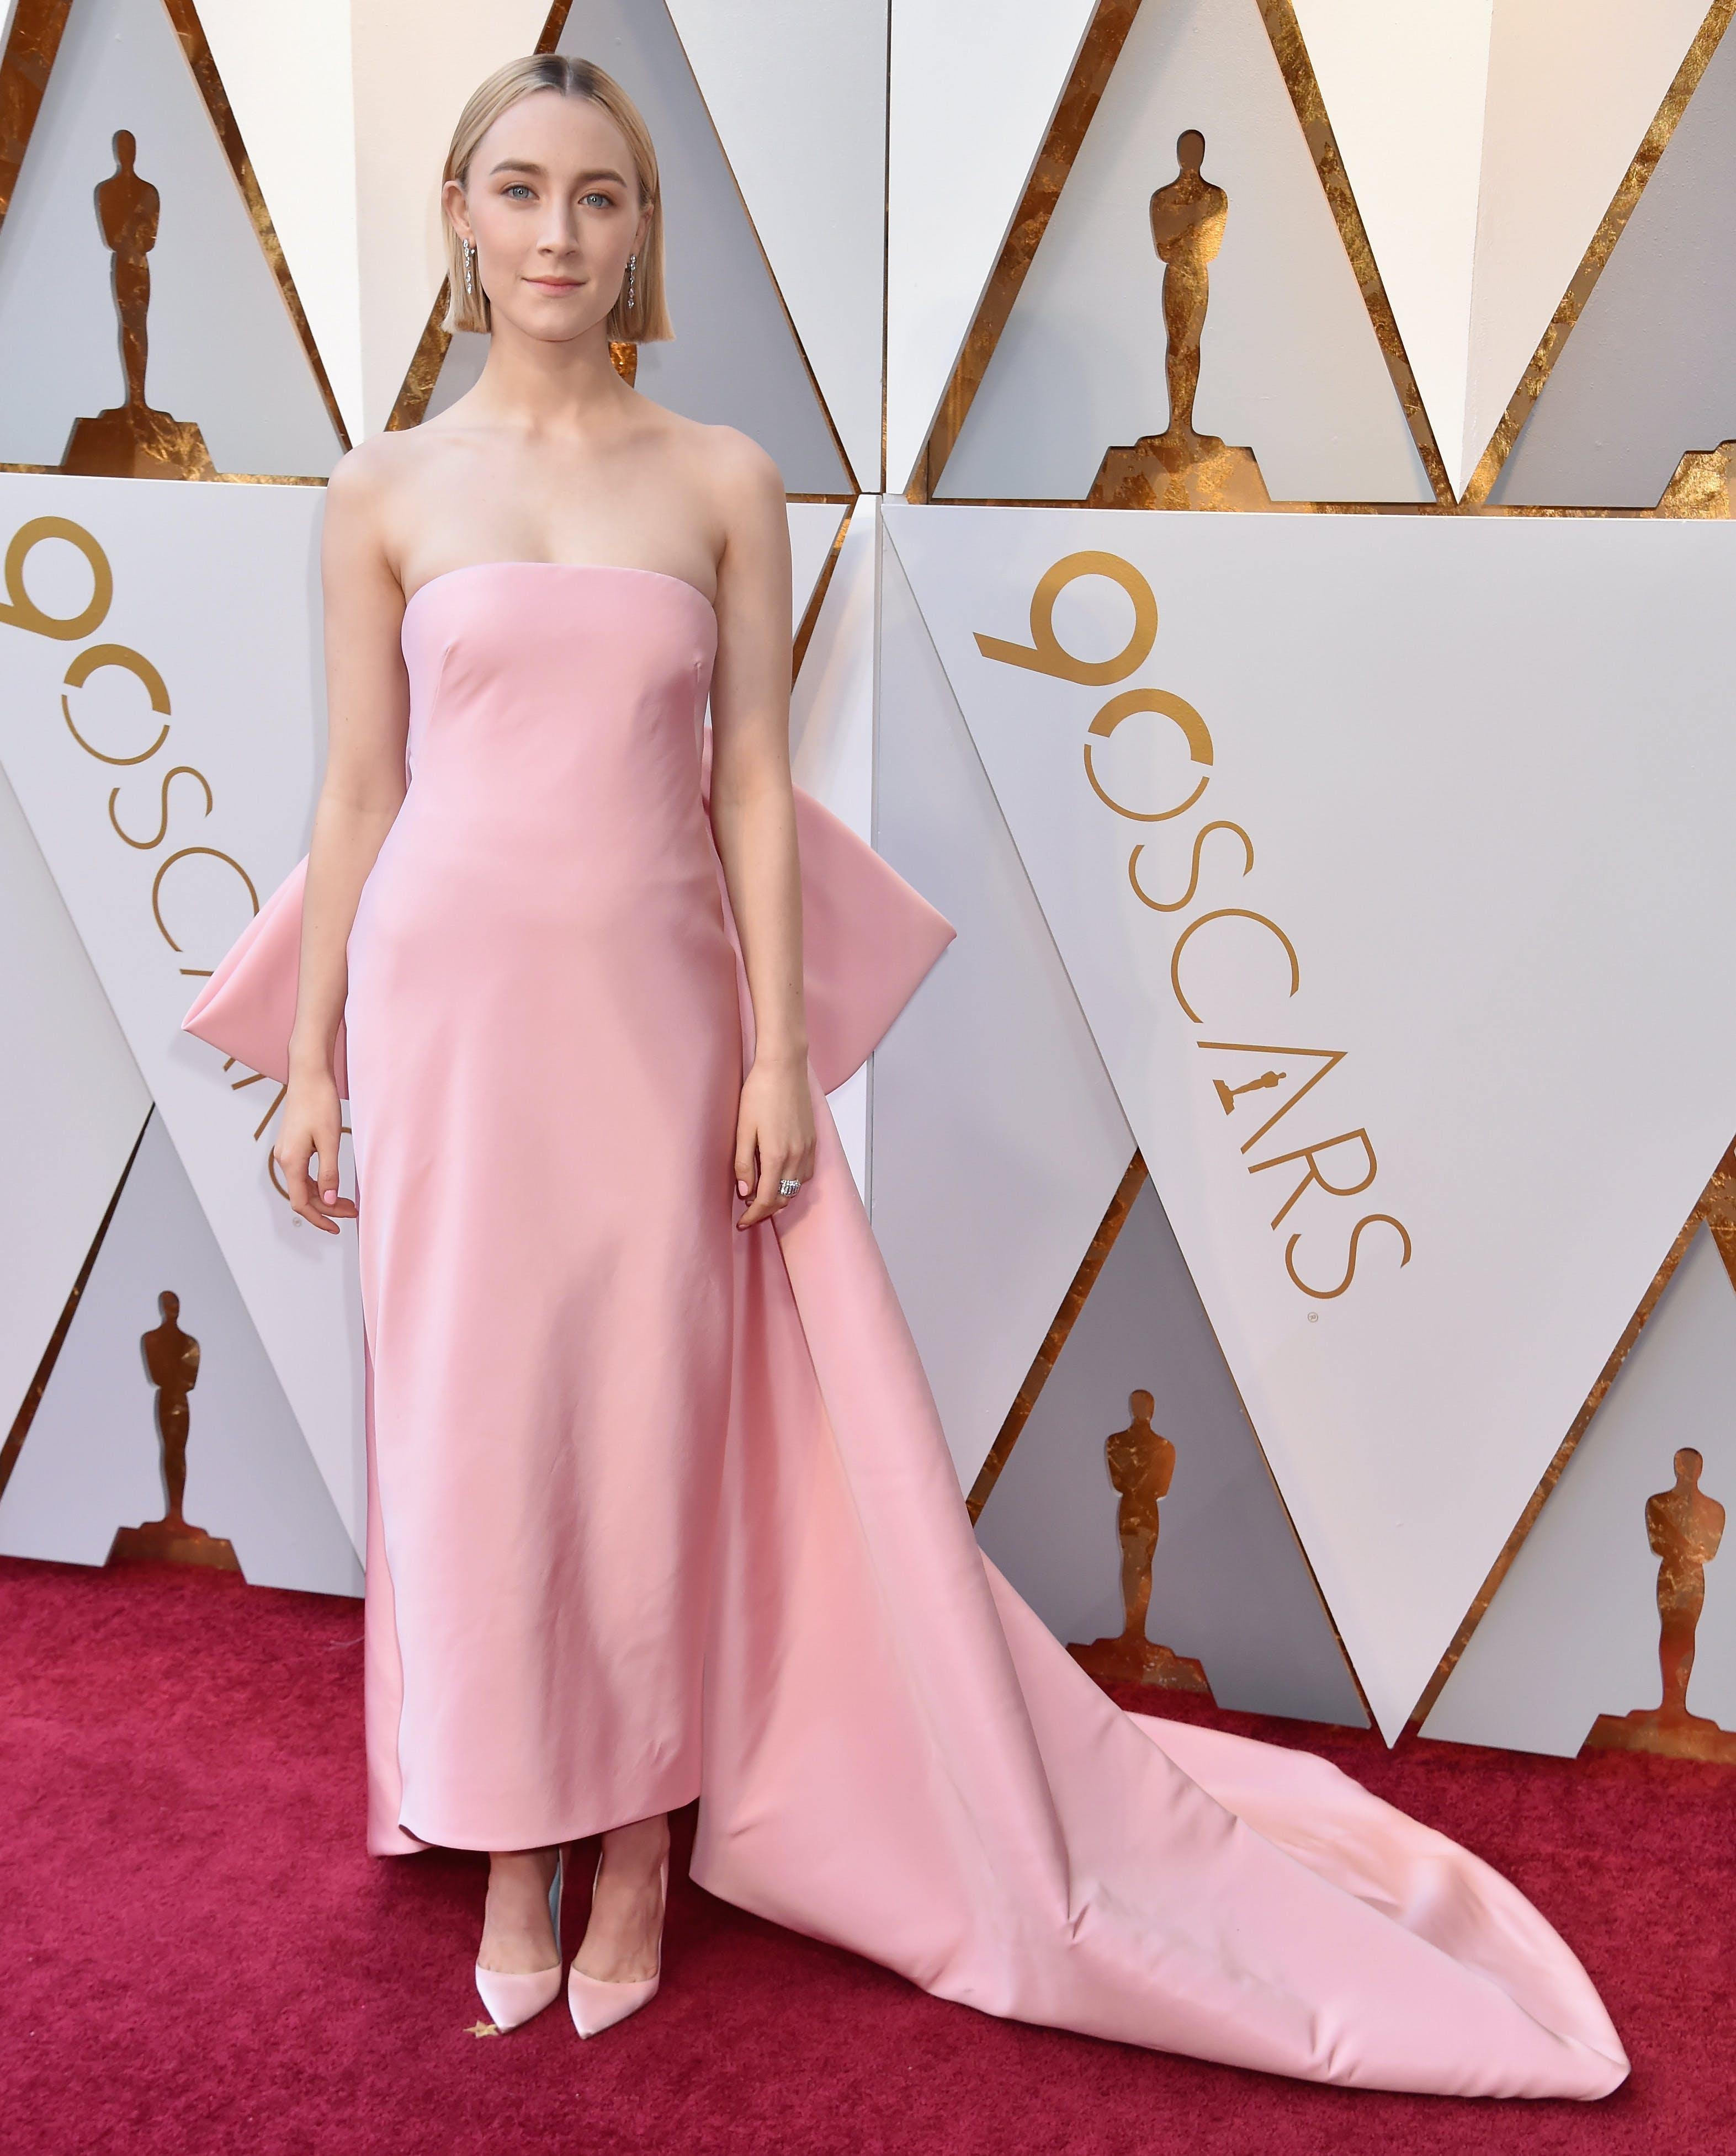 Saoirse Ronan at the 2018 Oscars